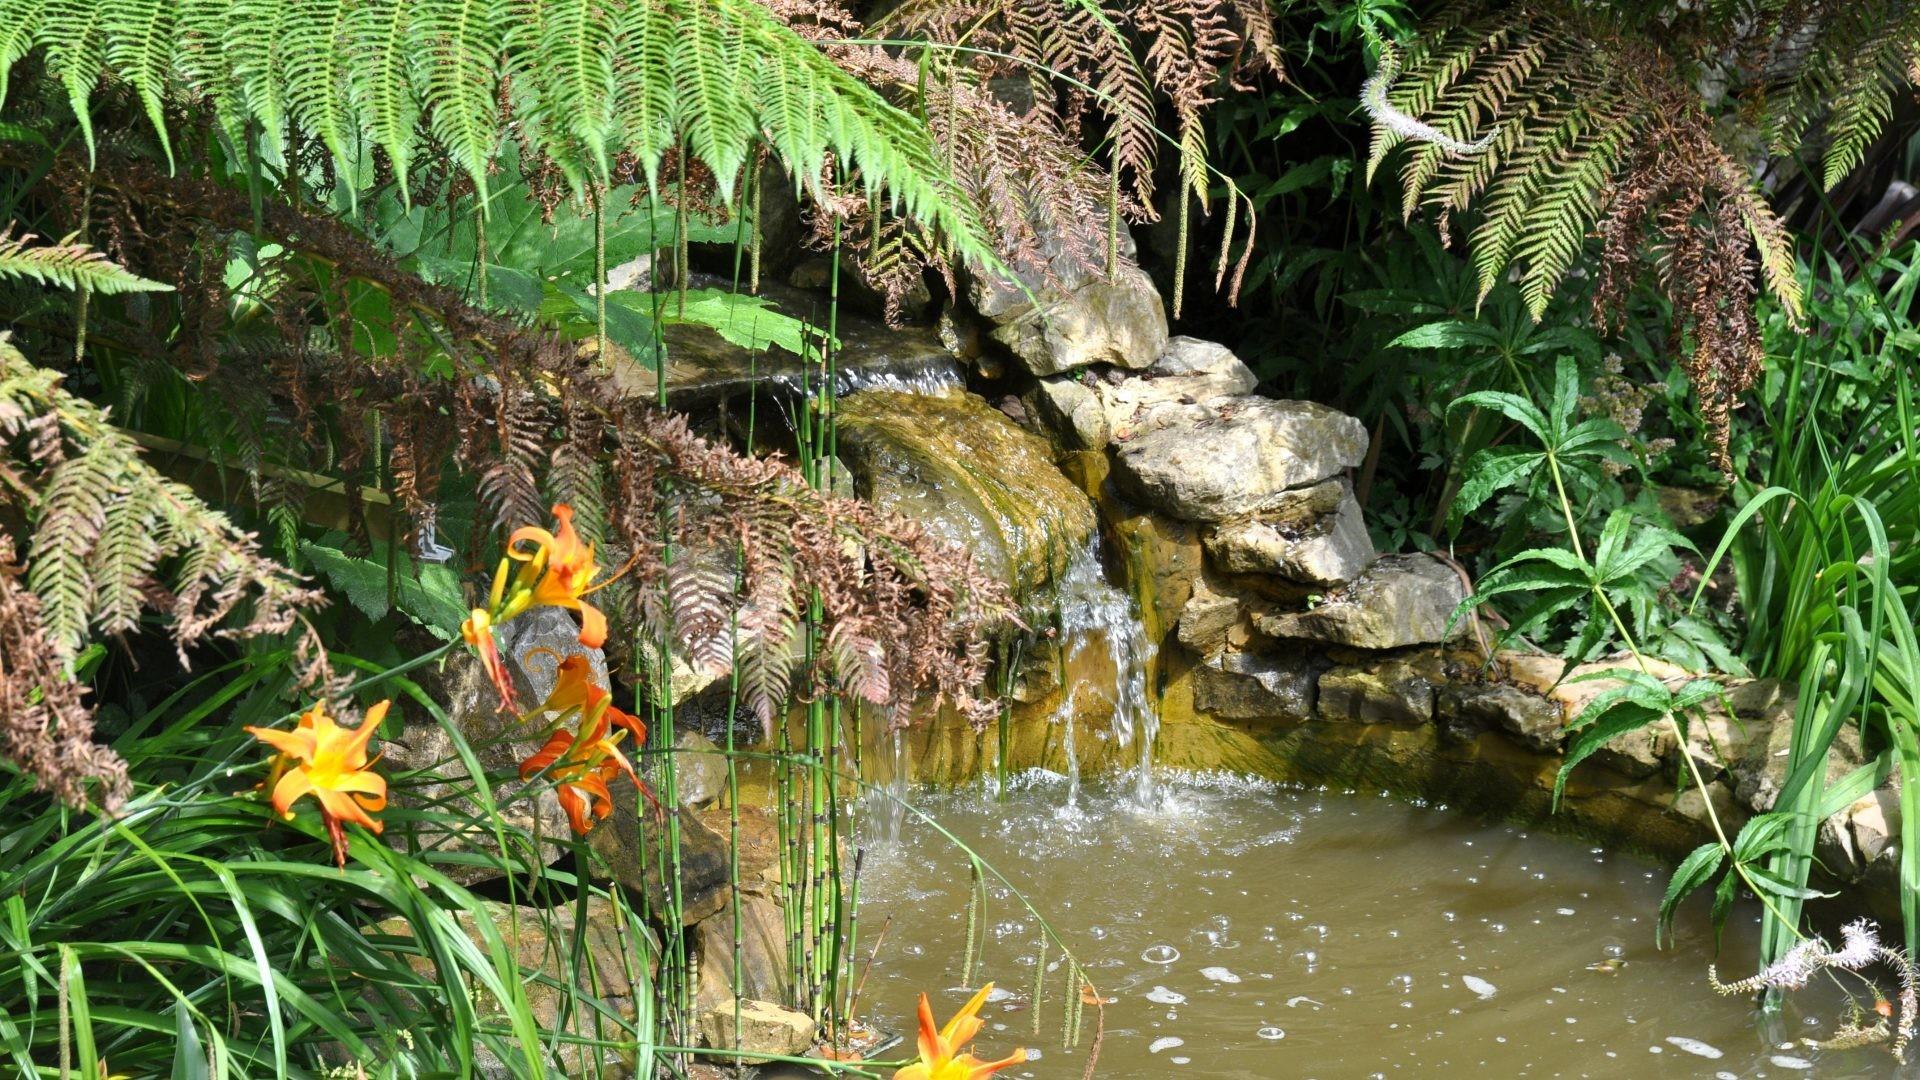 … Desktop Background Moving. 4288×2848. English Tag – Gardens British  United England English Pond Serenity Orange Water River Peace Serene Britain